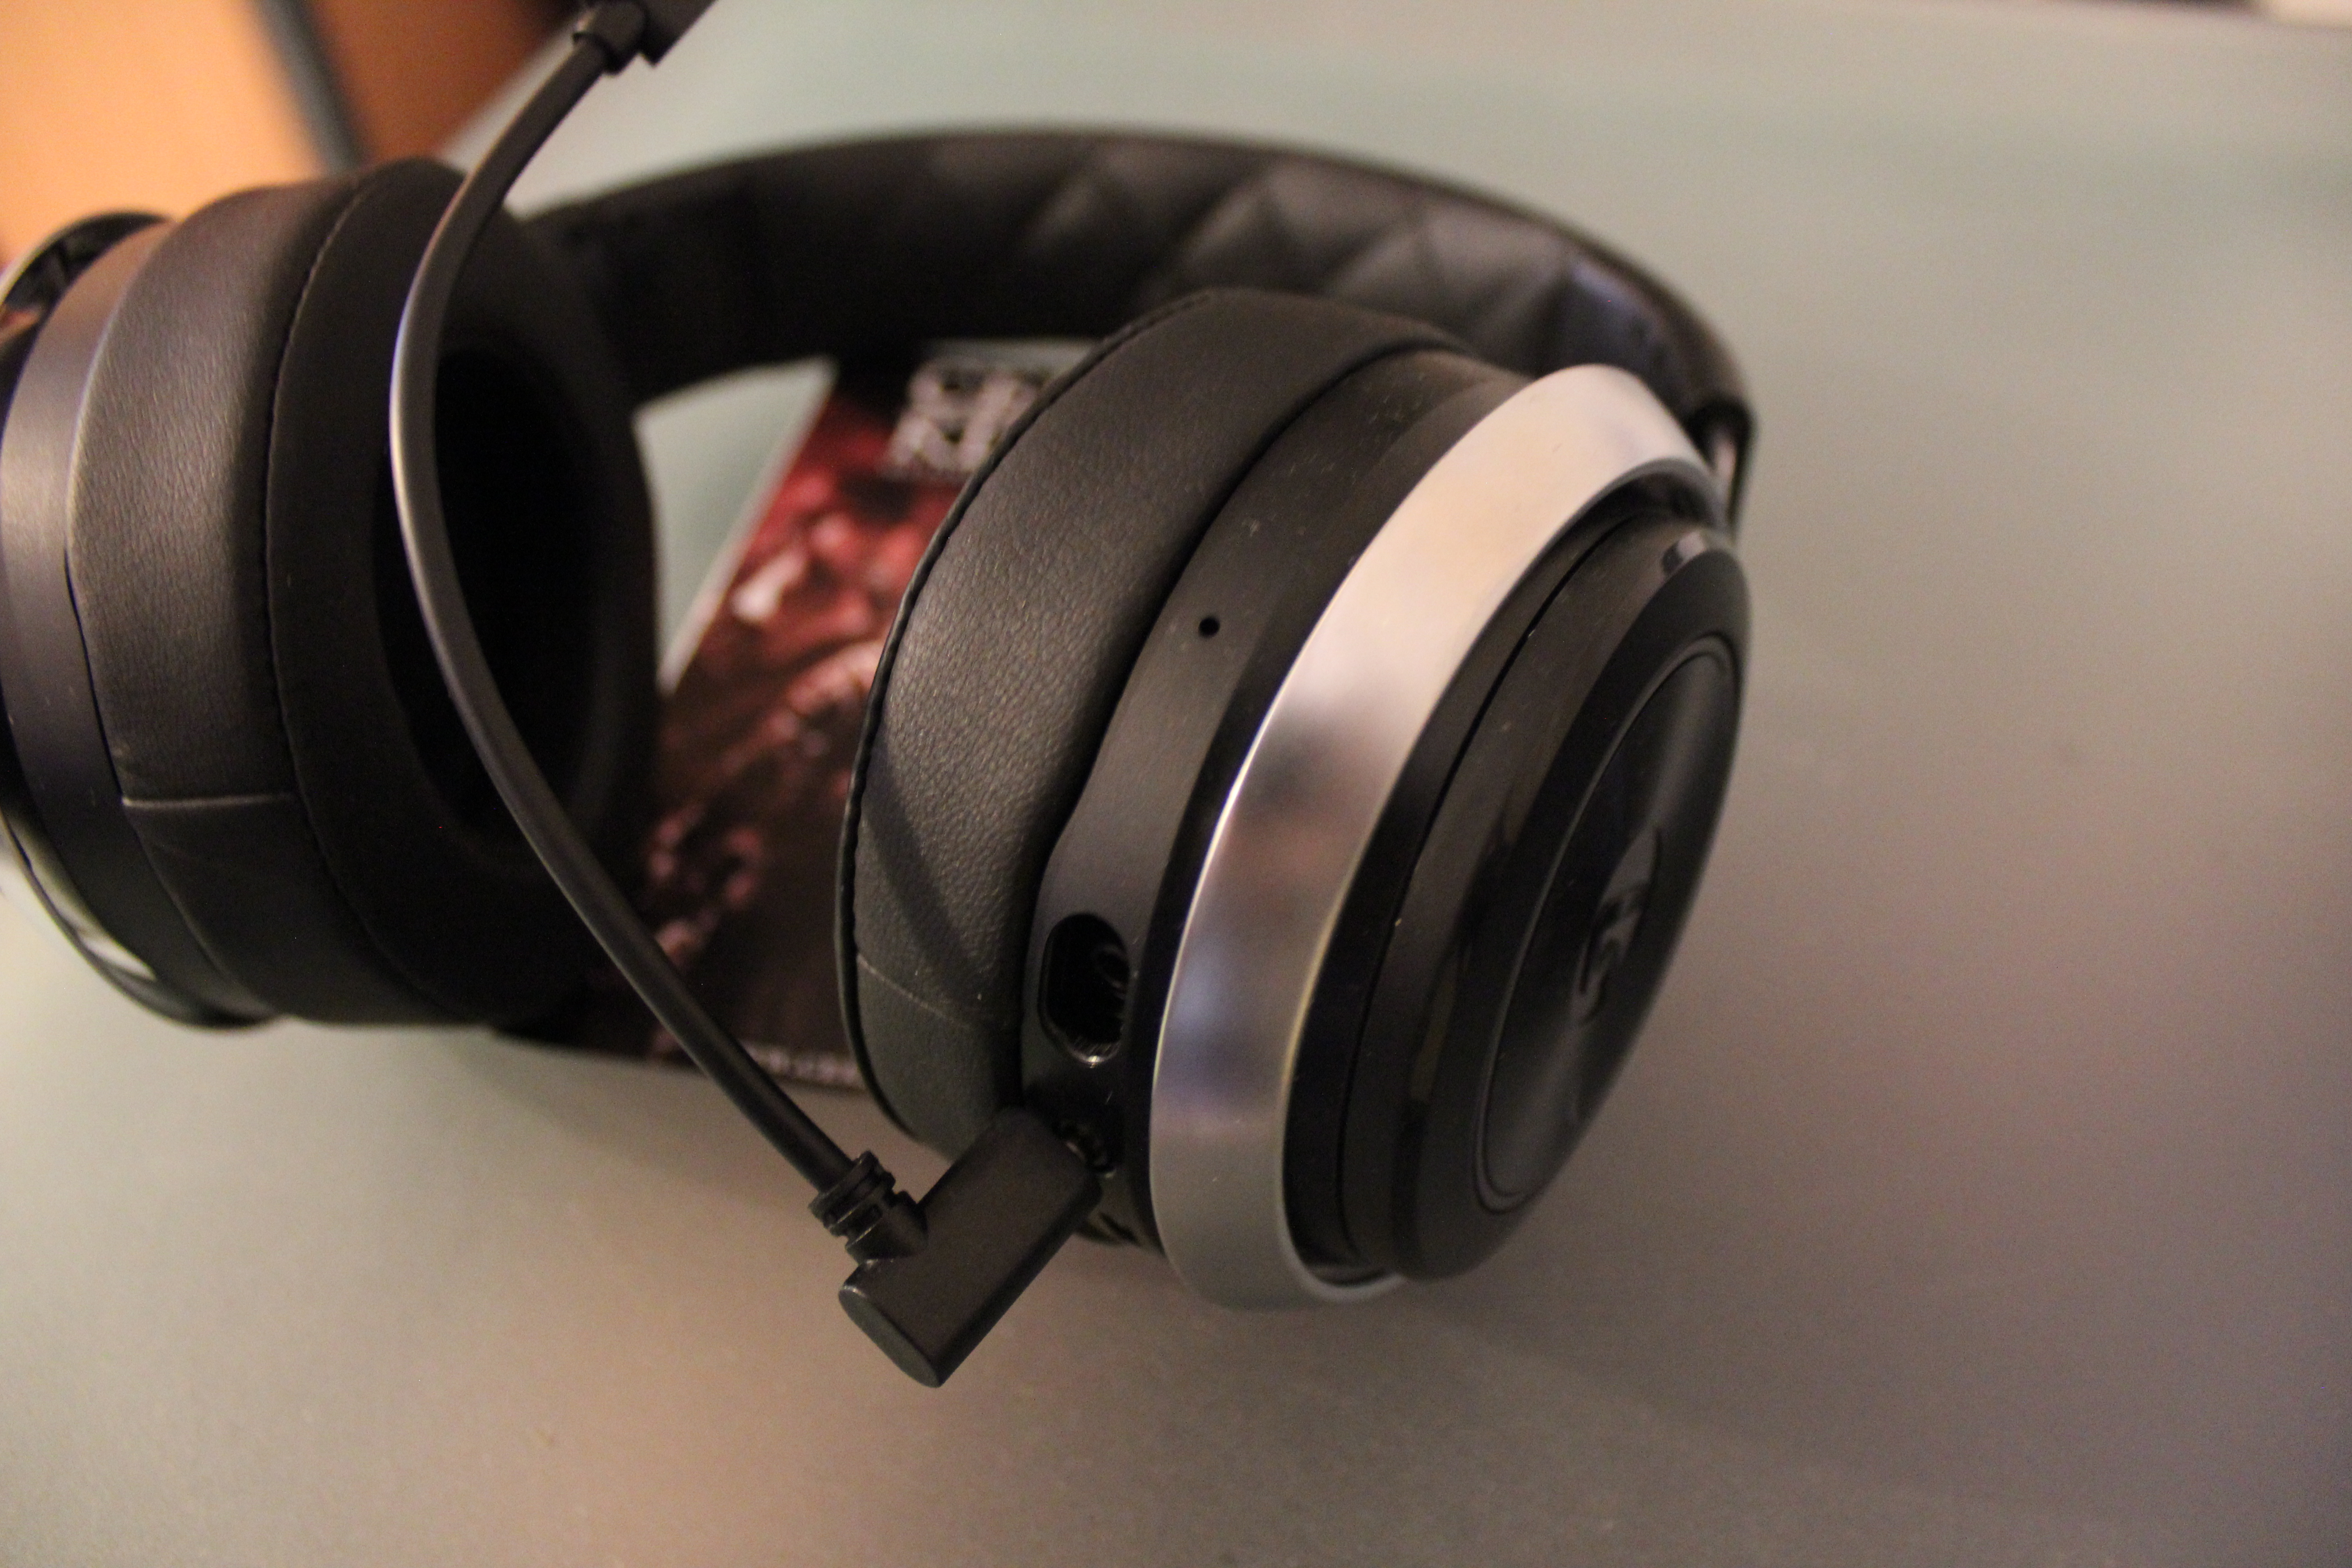 lucid sound ls30 wireless gaming im headset test. Black Bedroom Furniture Sets. Home Design Ideas